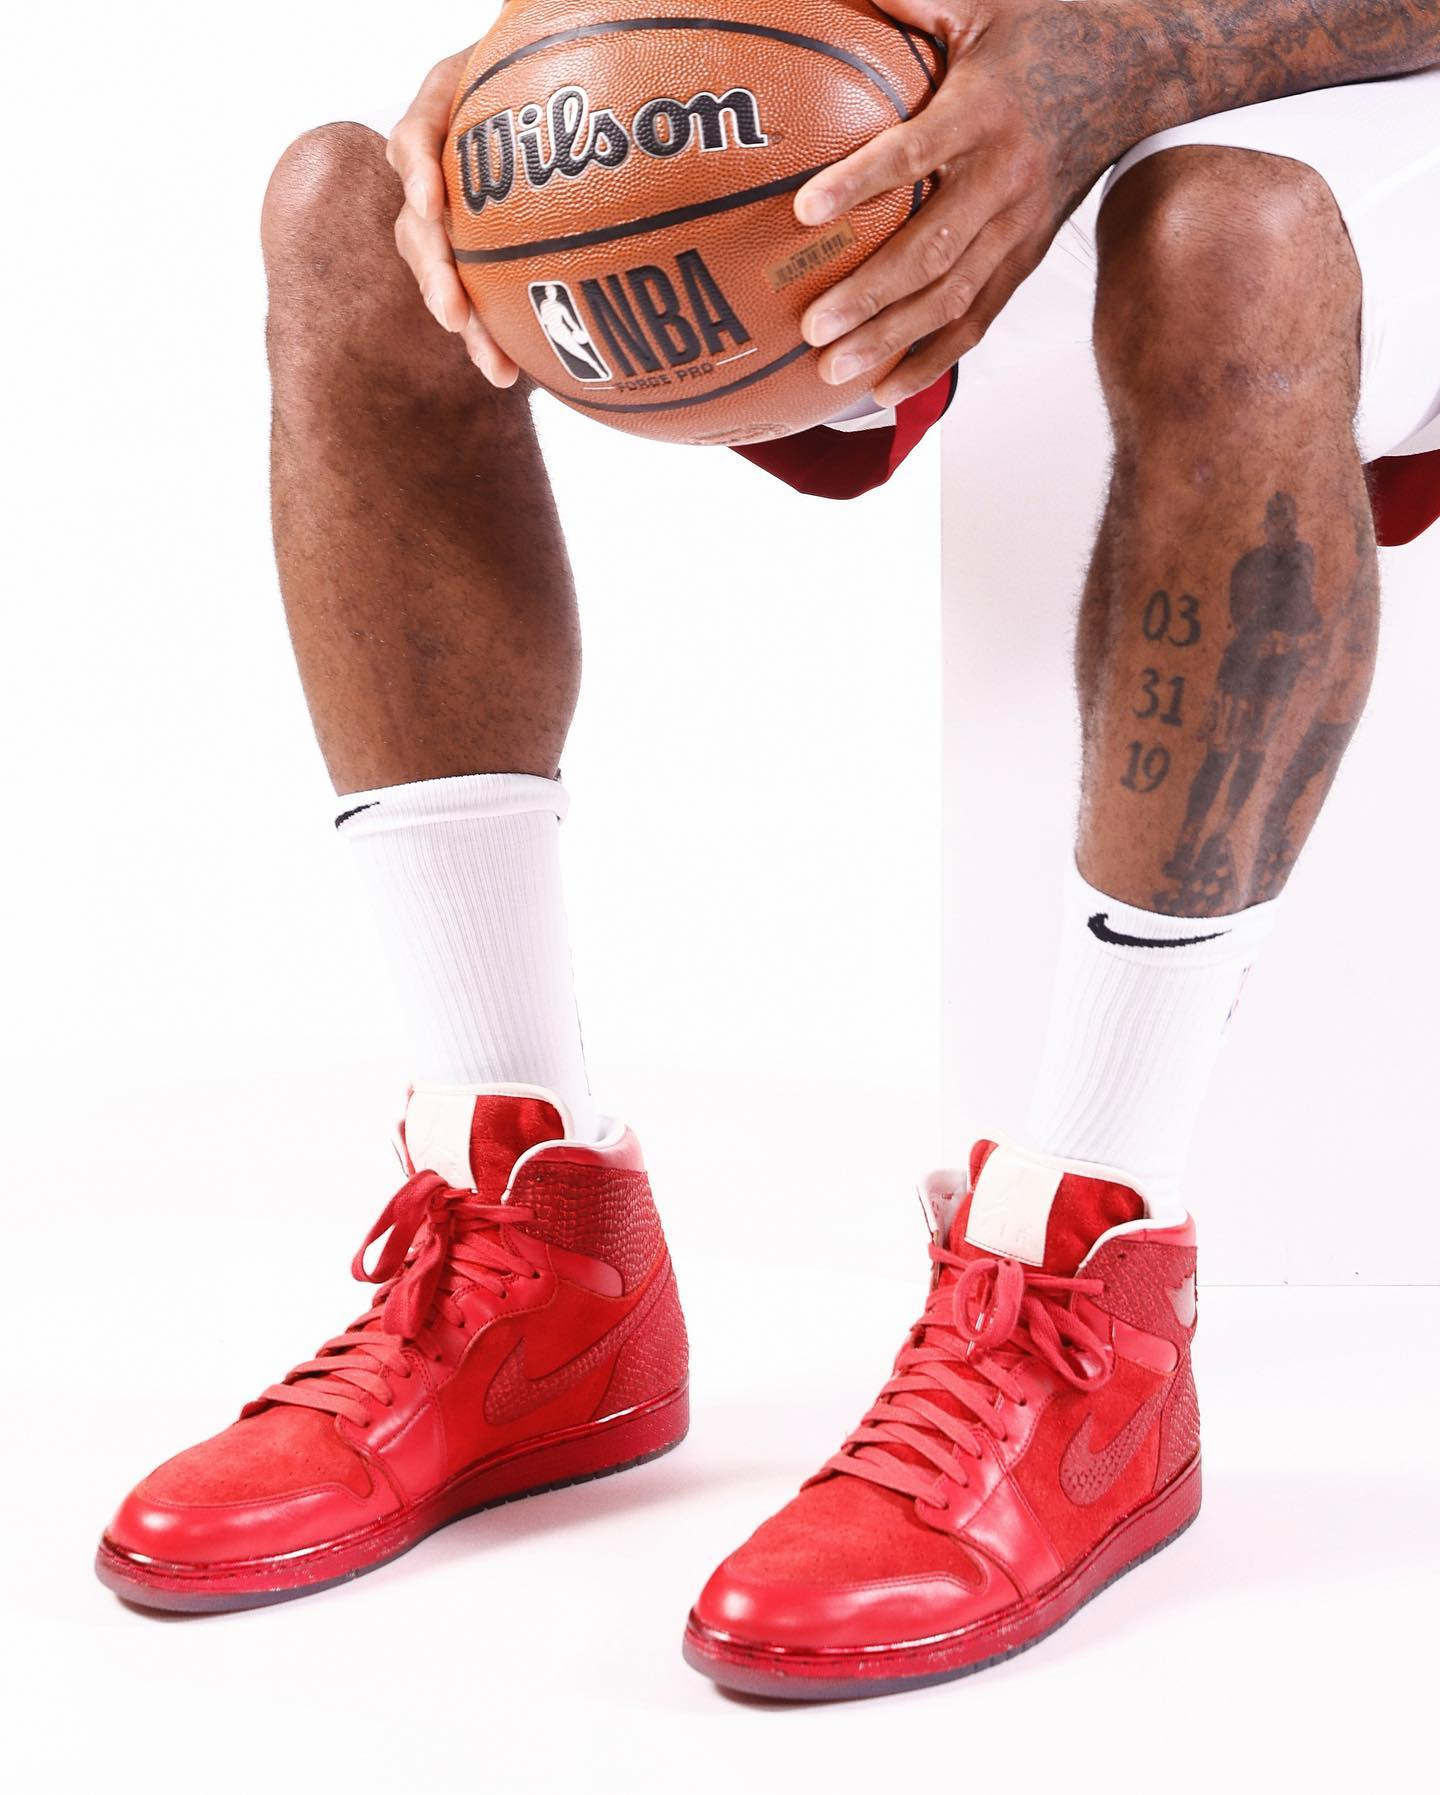 P.J.塔克,AJ1,Air Jordan 1  「鞋王」塔克称霸媒体日!上脚的天价 AJ1 你见过吗?